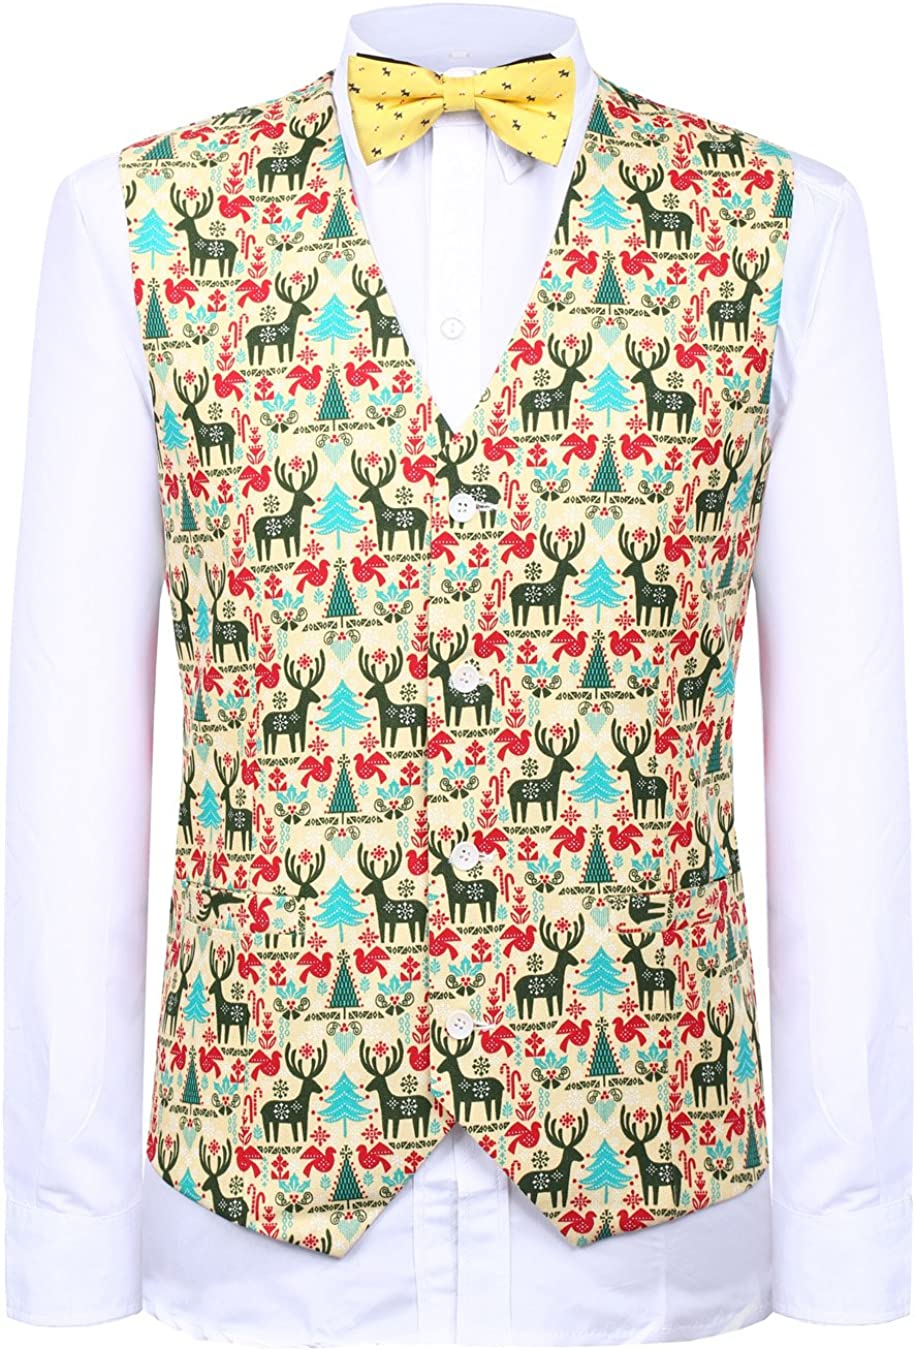 Hanayome Men's Waistcoat Garment Christmas Suits Jackets Vest Sleeveless Plus Size